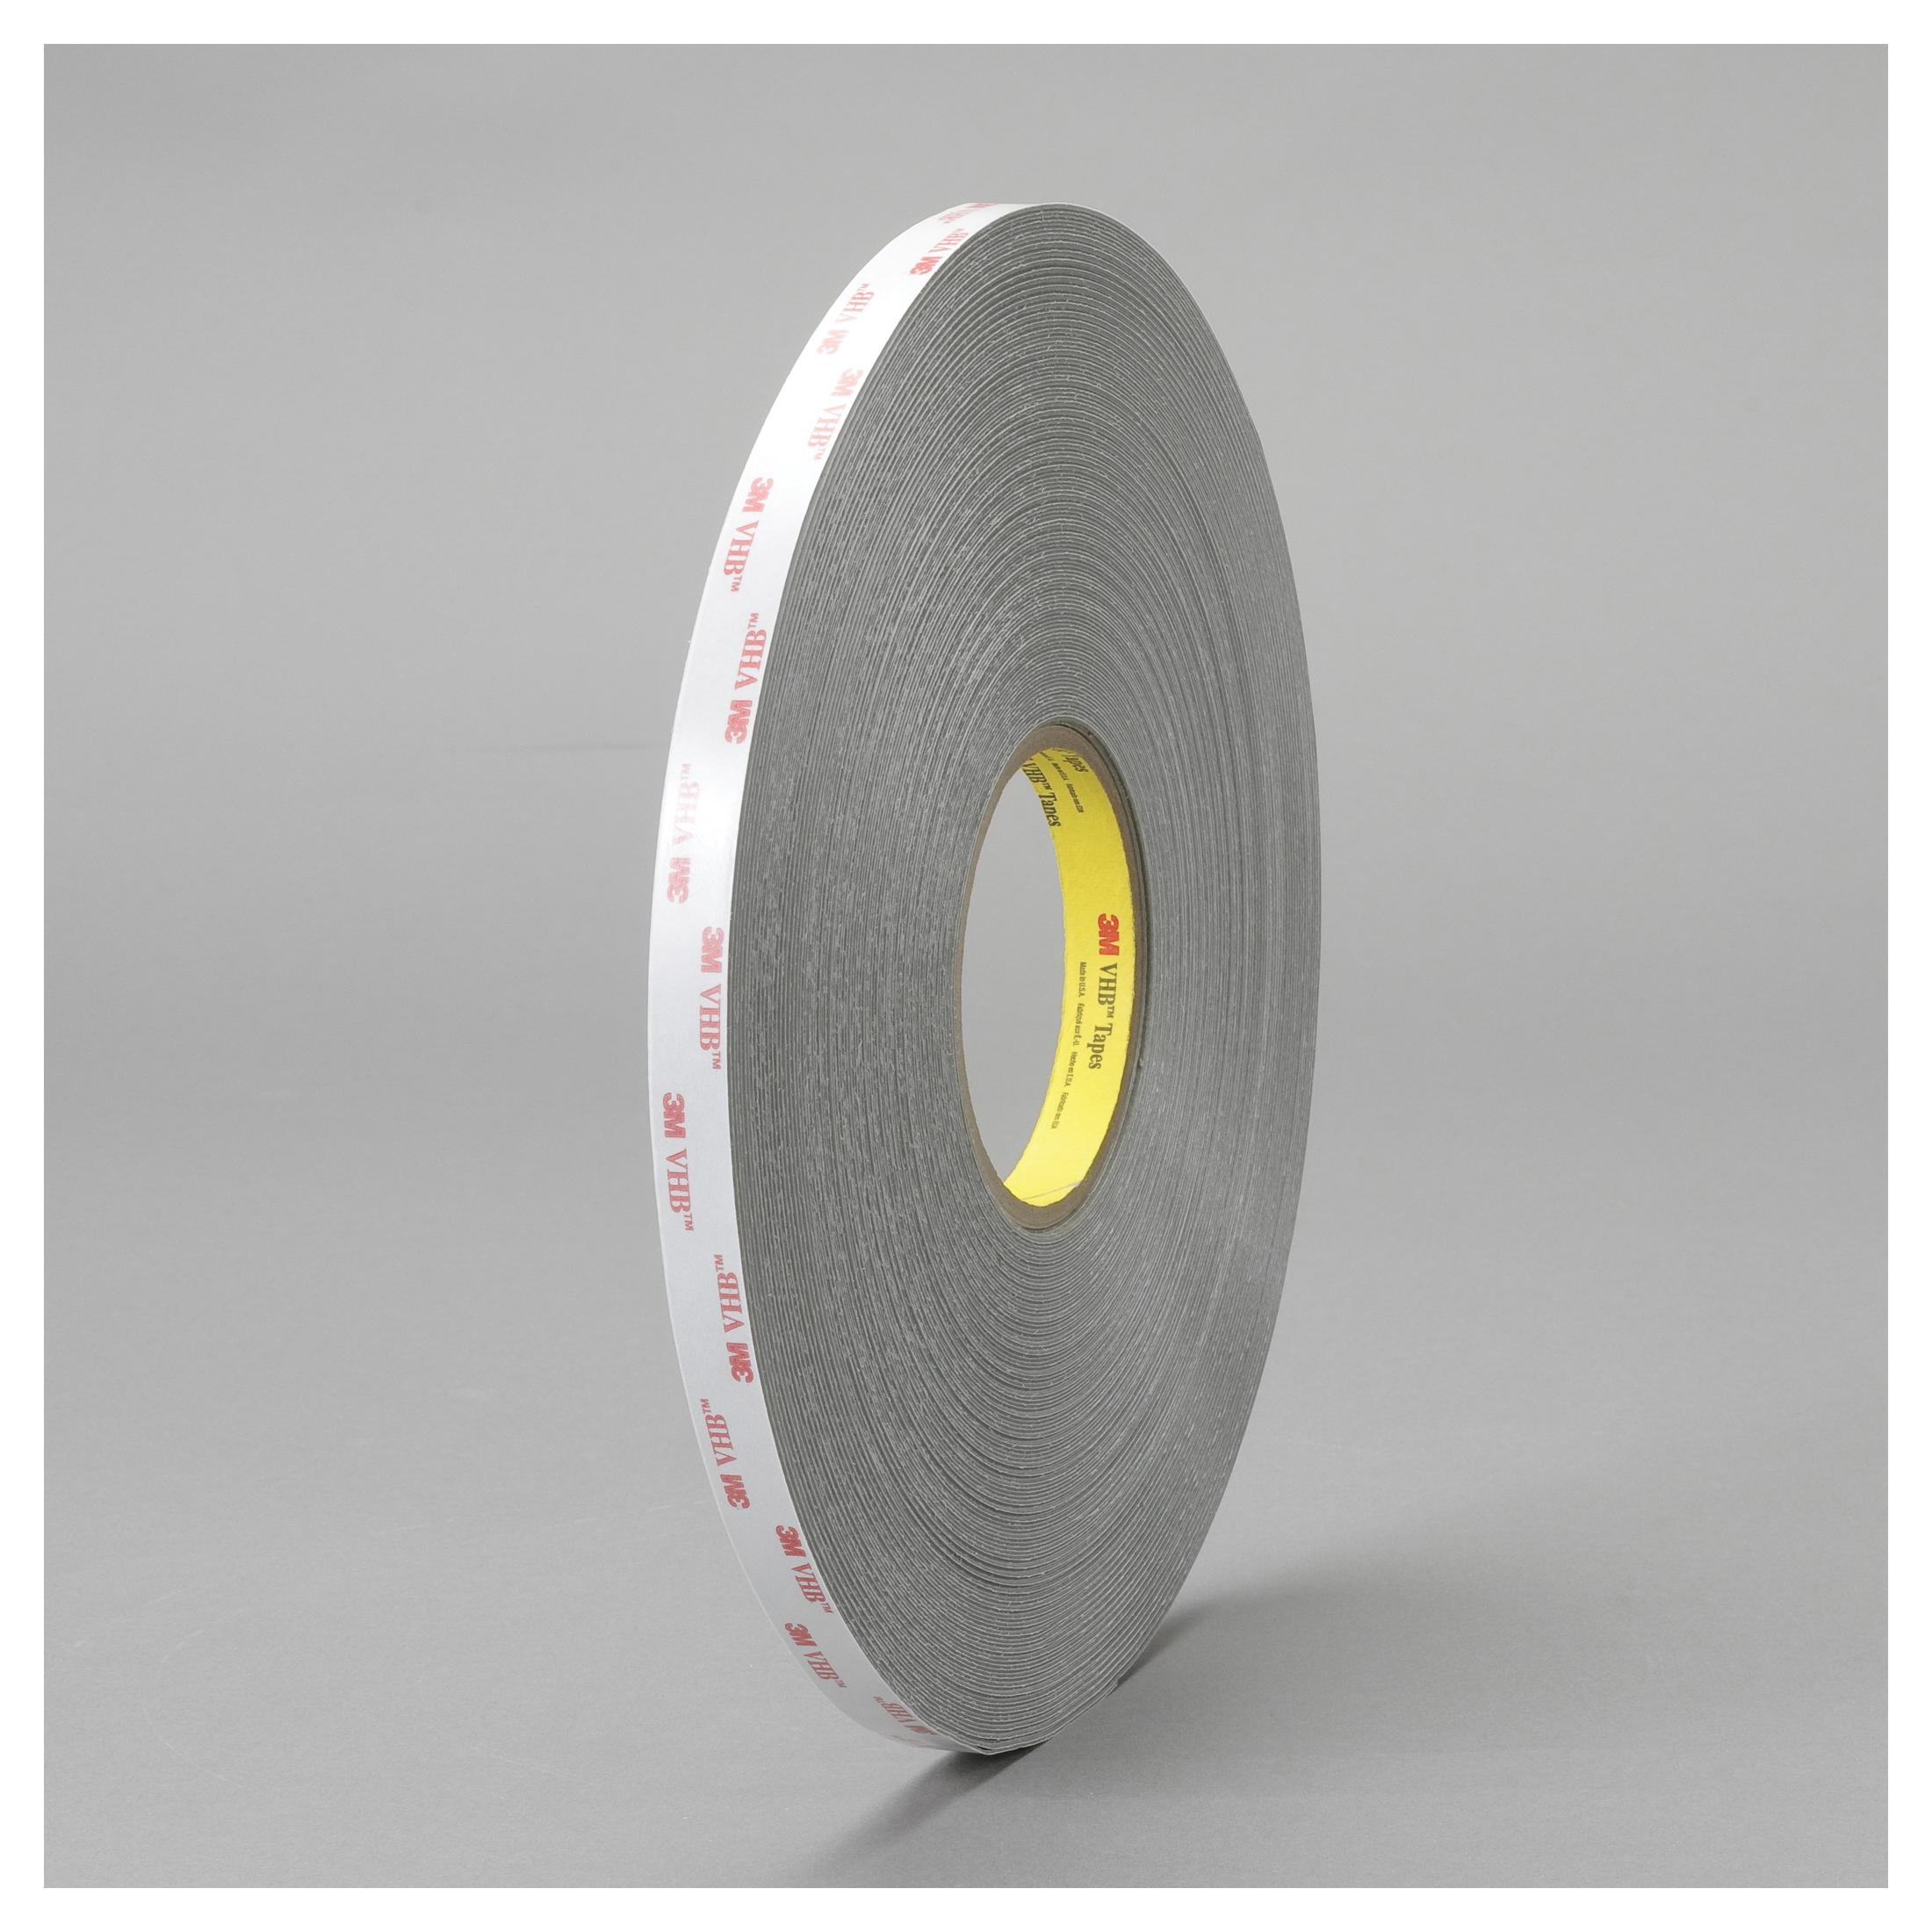 3M™ VHB™ 021200-64620 Pressure Sensitive Double Sided Bonding Tape, 72 yd L x 1 in W, 0.025 in THK, Multi-Purpose Acrylic Adhesive, Acrylic Foam Backing, Gray